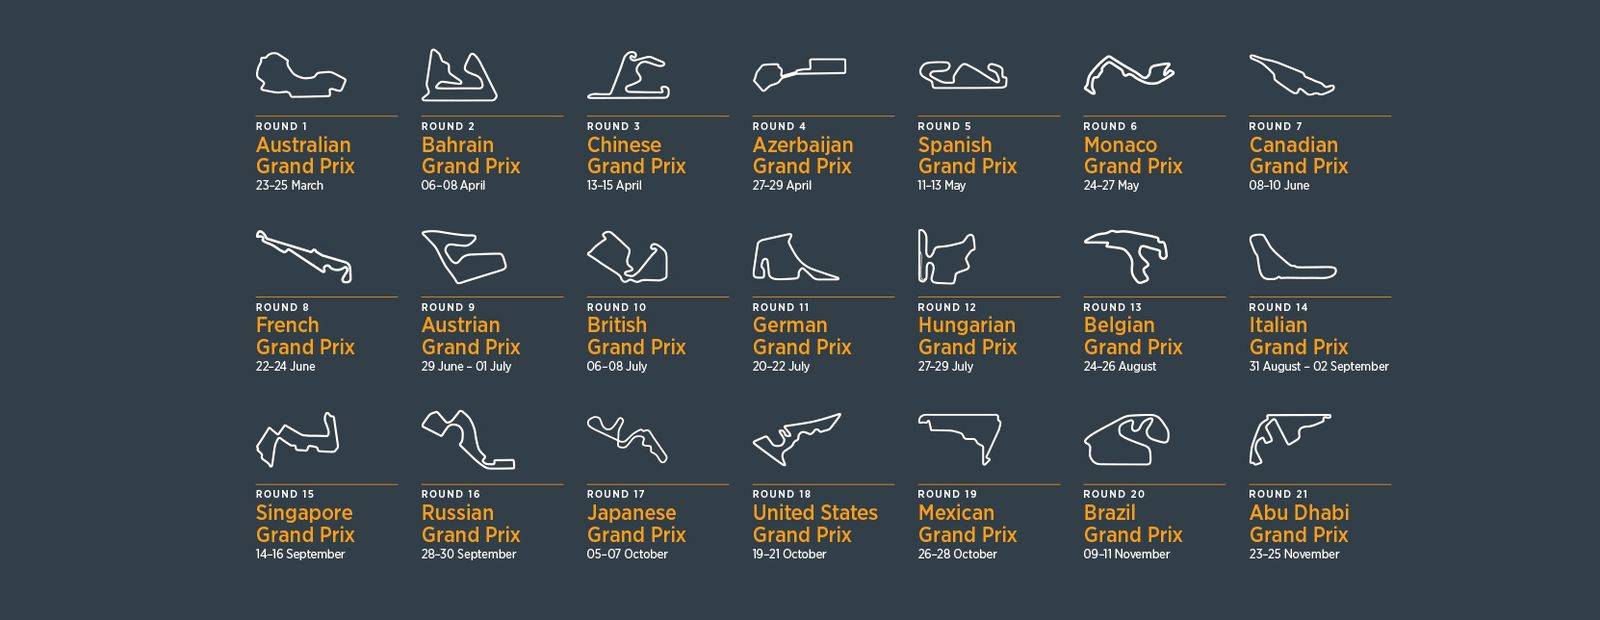 McLaren Racing - 2018 F1 toolkit